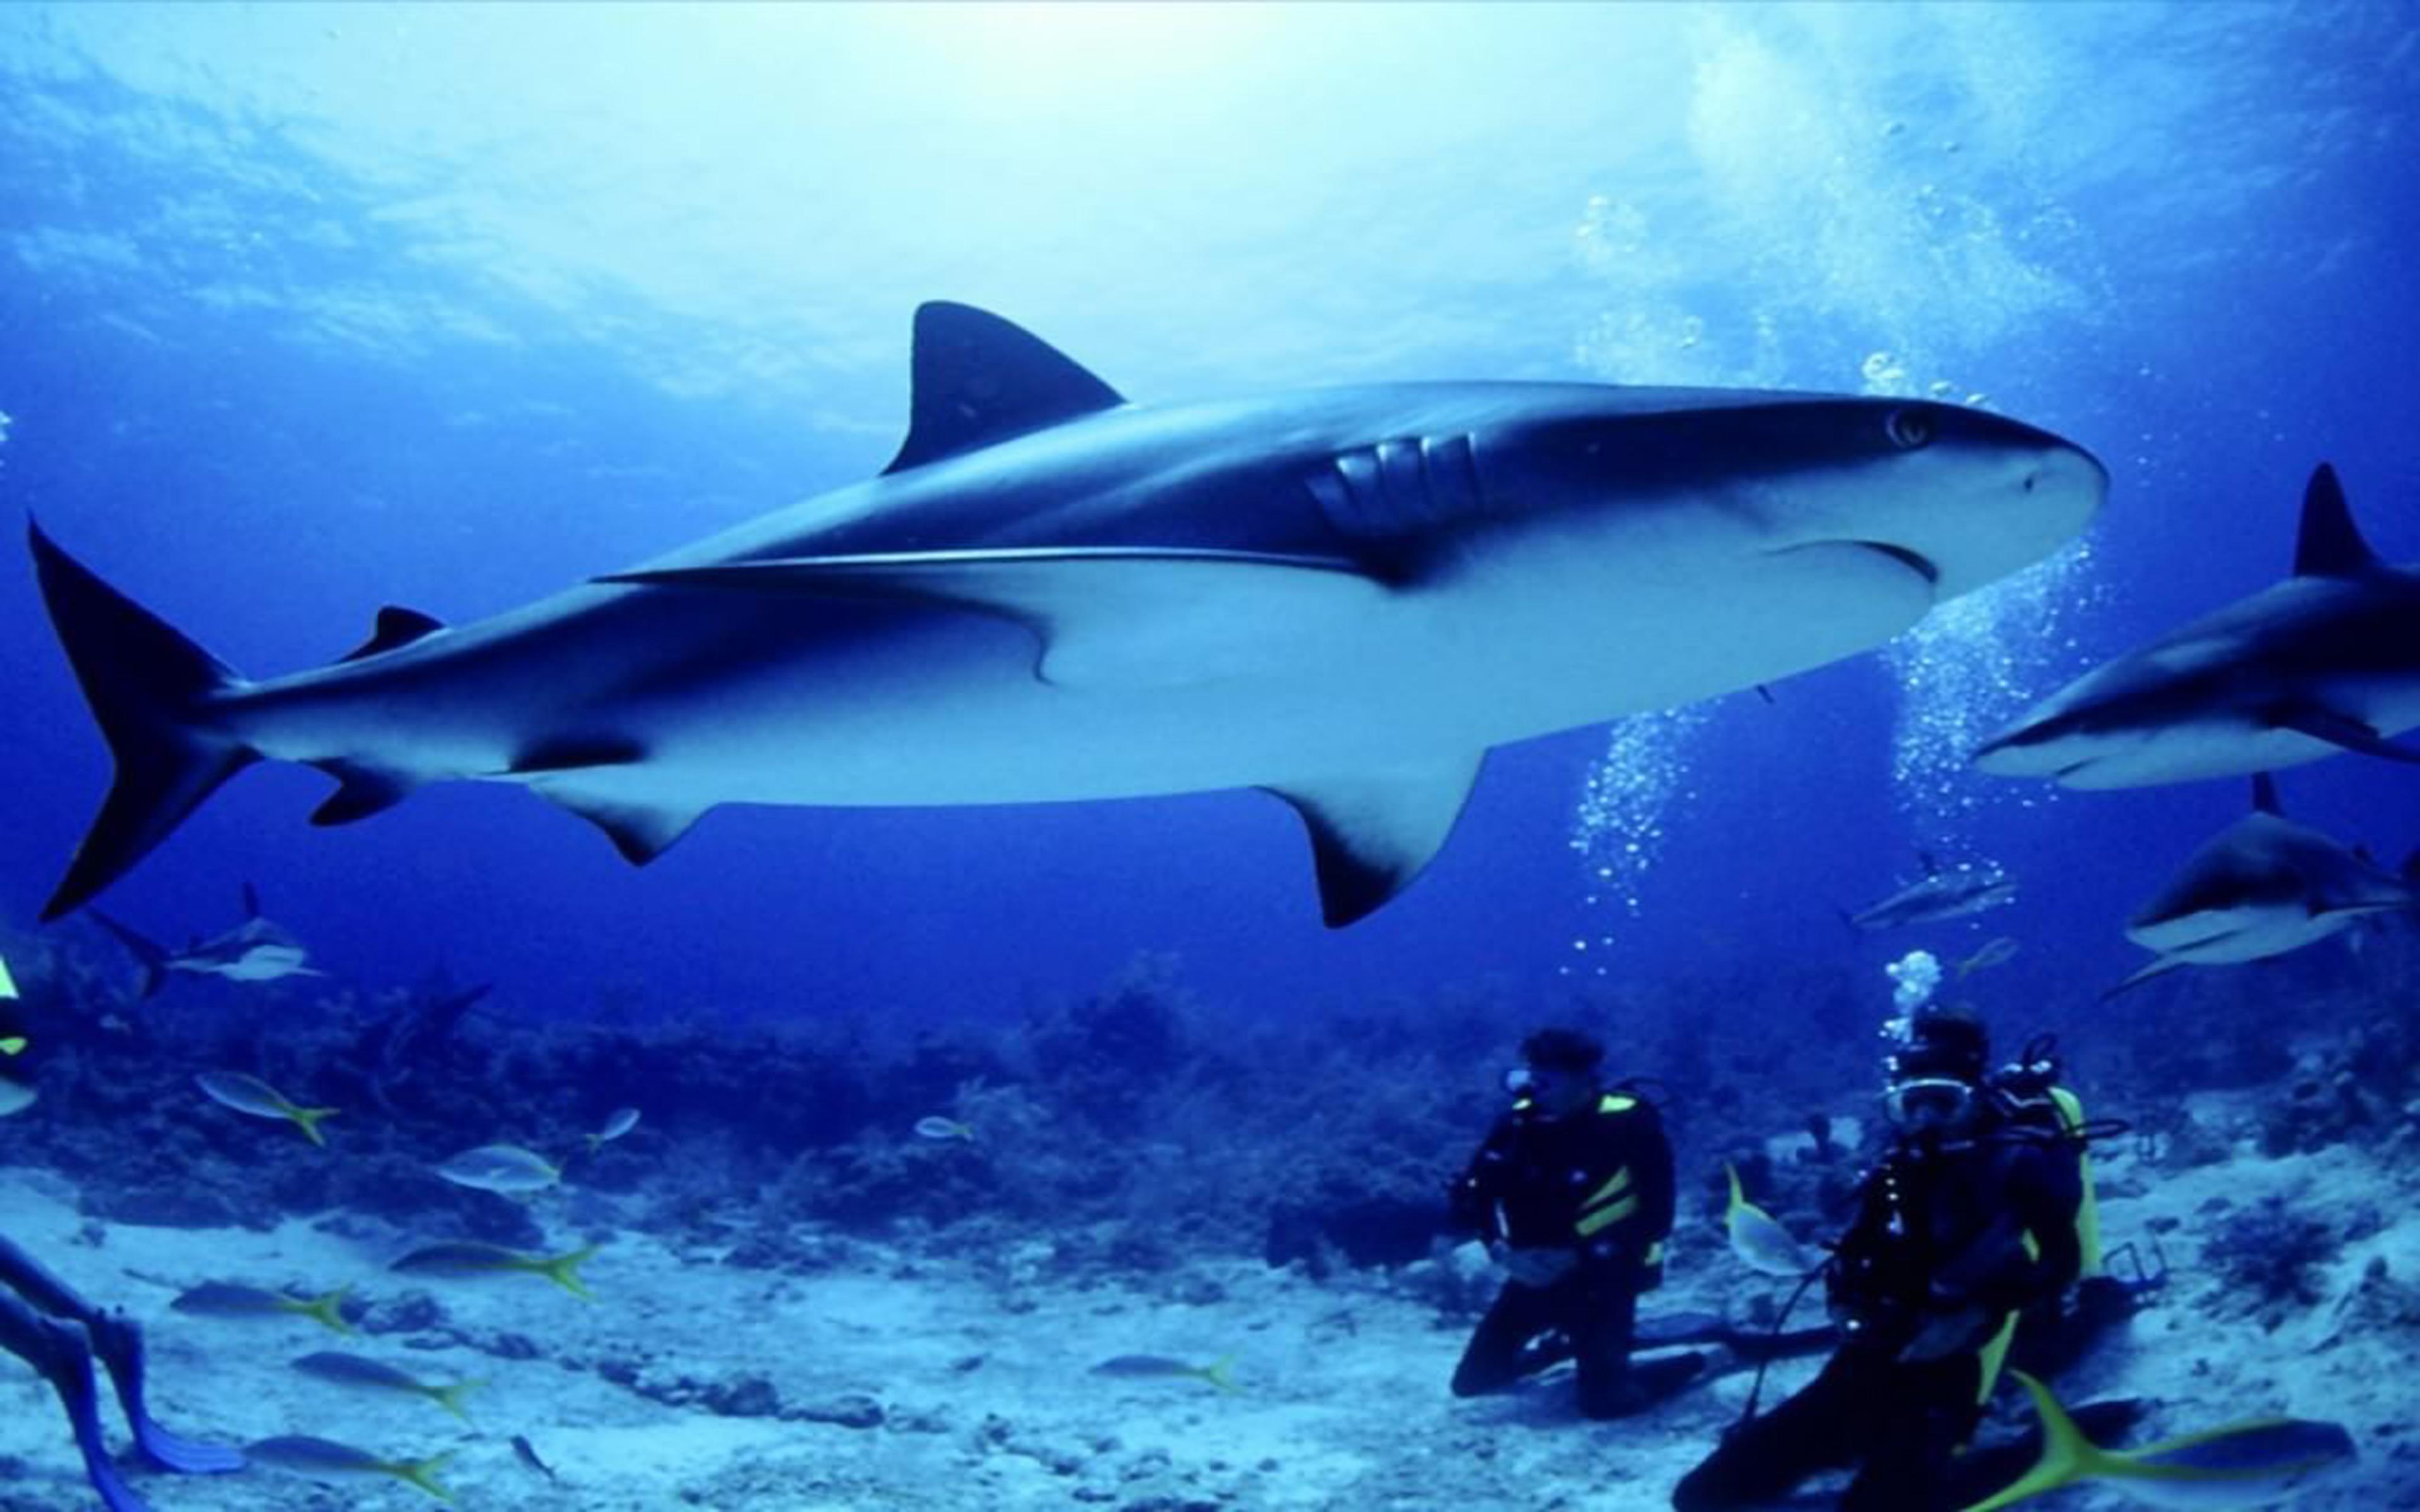 Koi Wallpaper Iphone Seabed Shark Fish Divers Hd Wallpapers For Desktop